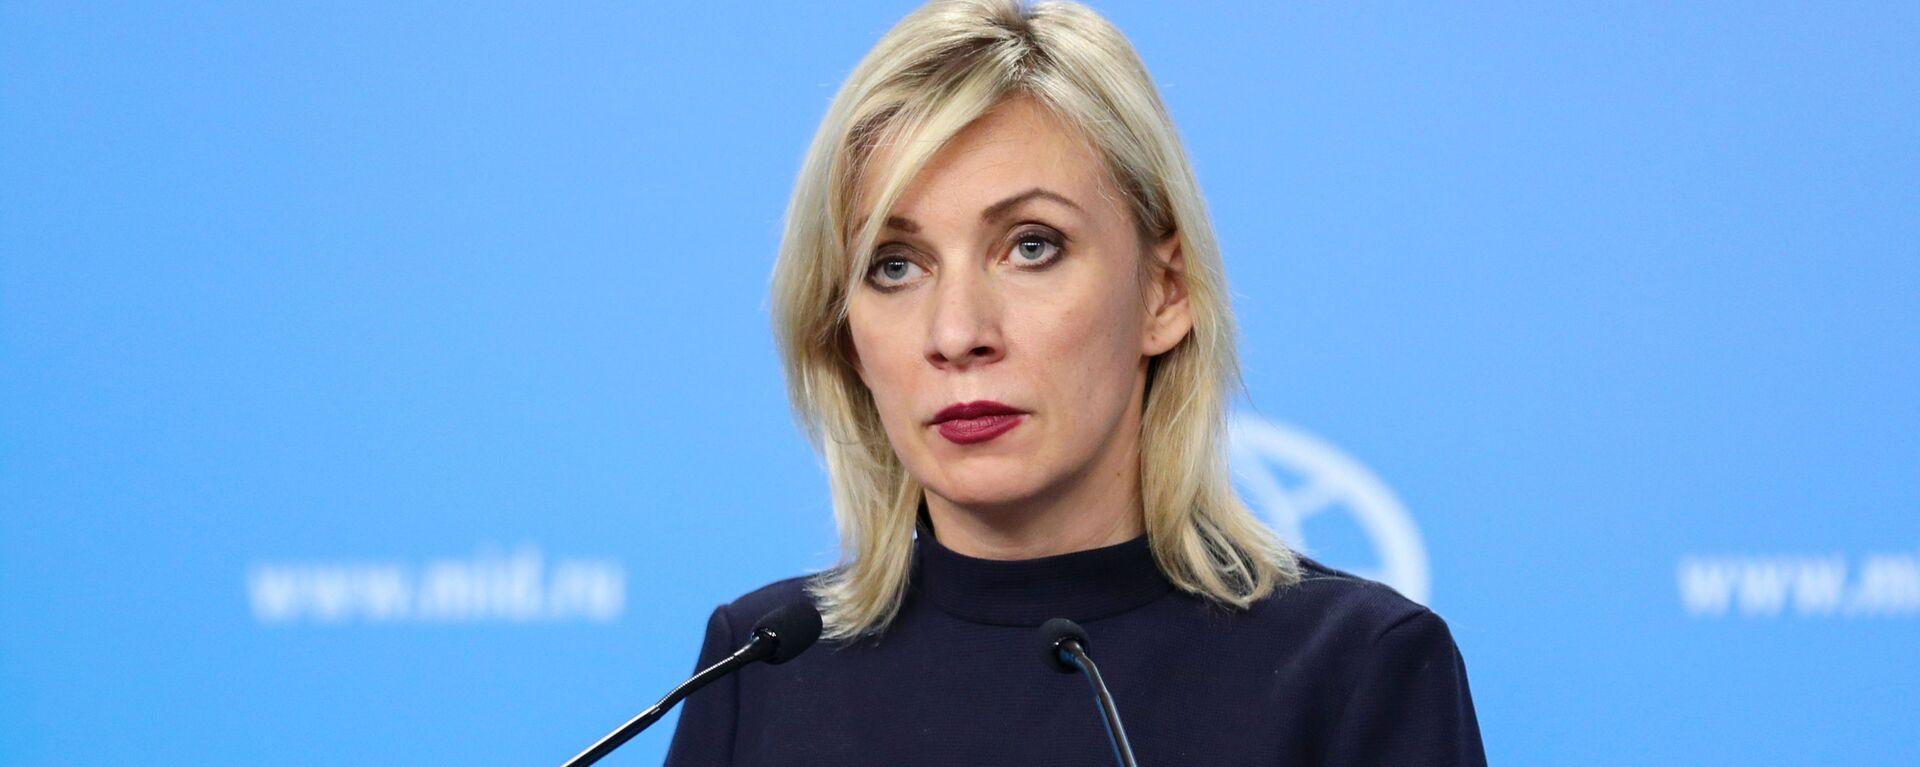 María Zajárova, portavoz del Ministerio de Exteriores de Rusia - Sputnik Mundo, 1920, 14.03.2021